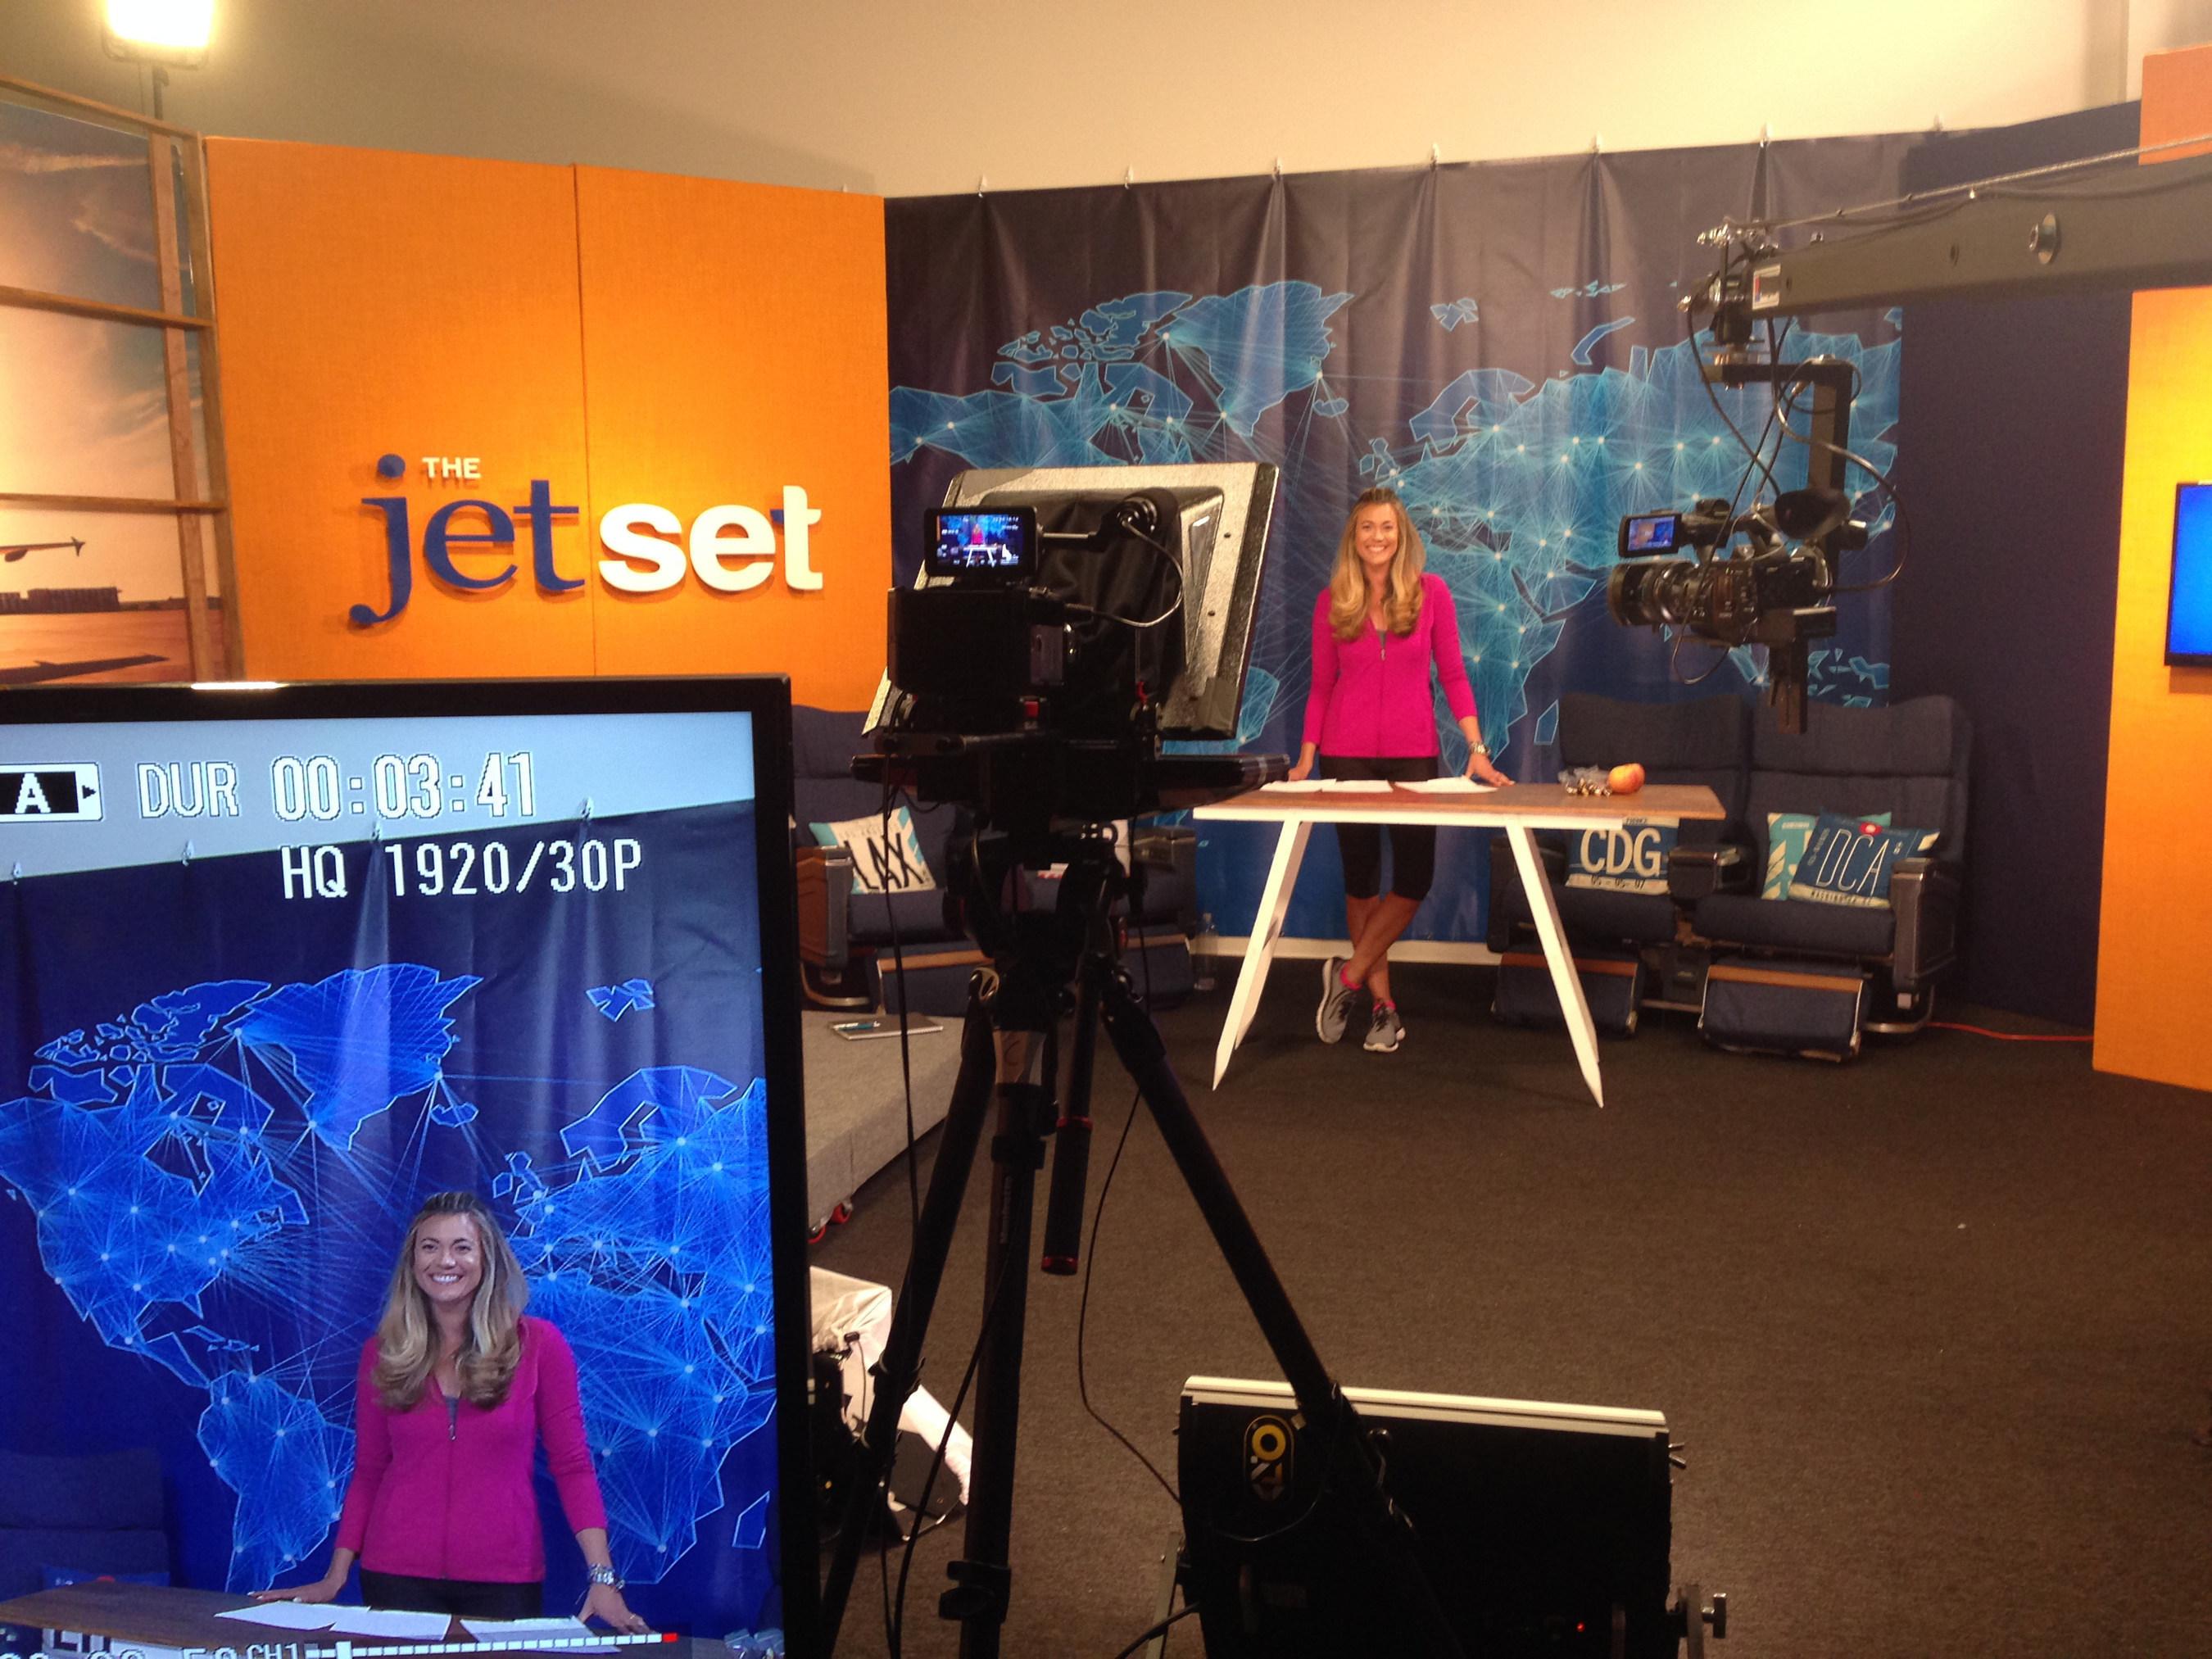 Health and Wellness Coach Nikki Noya Joins the Cast of The Jet Set